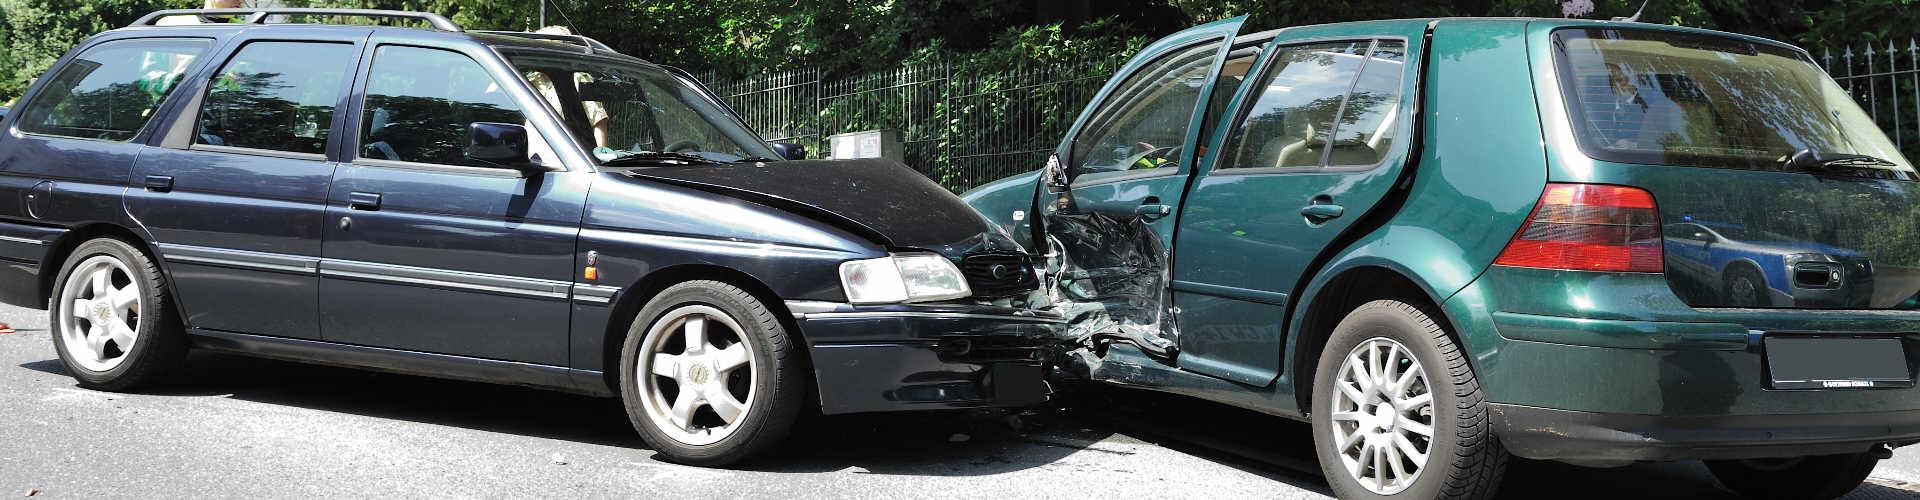 Schadengutachten nach Unfall Jena